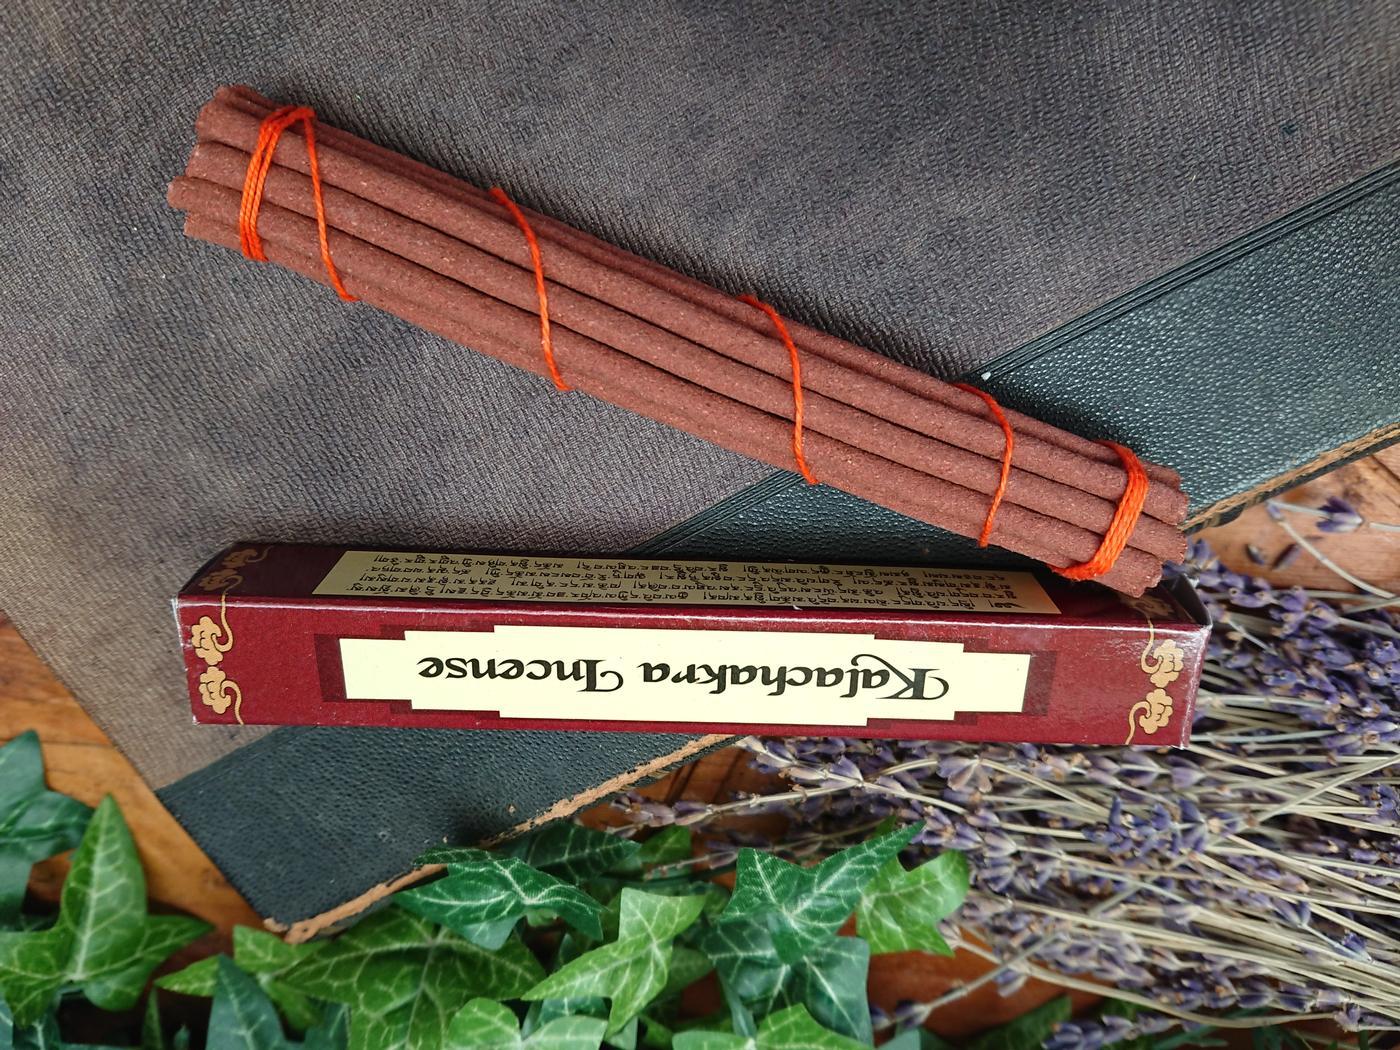 Tibetan Kalachakra Incense